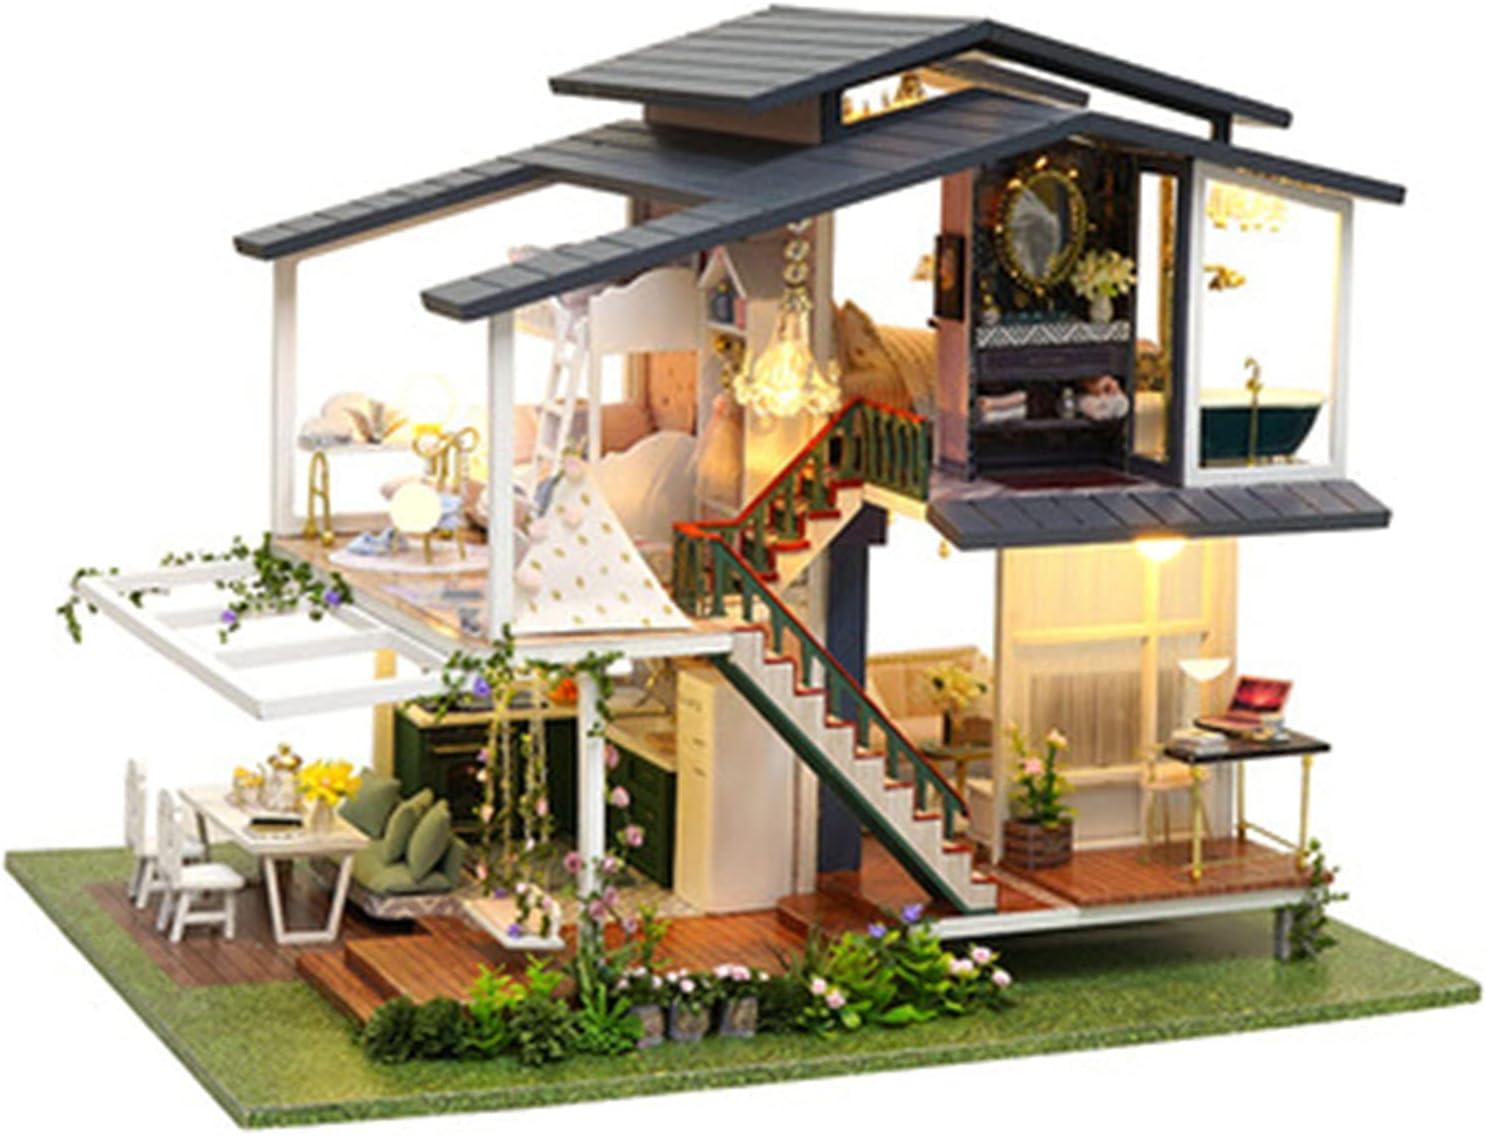 YXLYLL Handmade DIY Cottage Latest item Large Spring new work Assembled Buildin Garden Villa